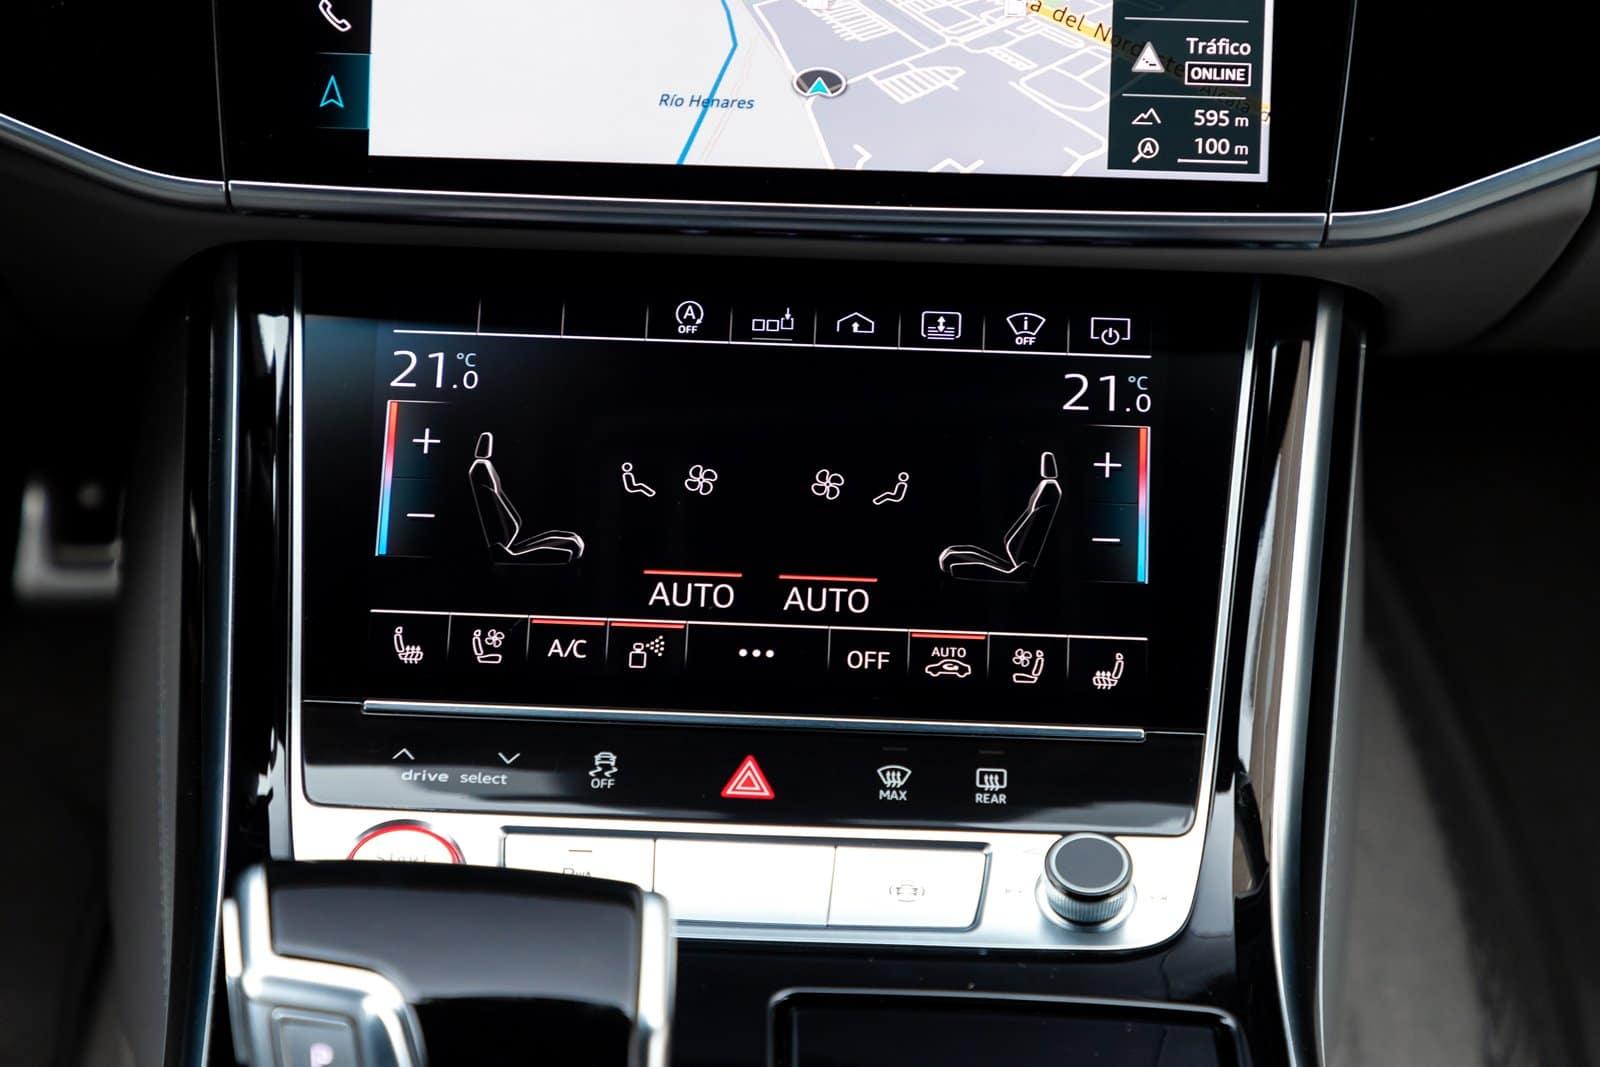 Pantalla climatizador Audi S8